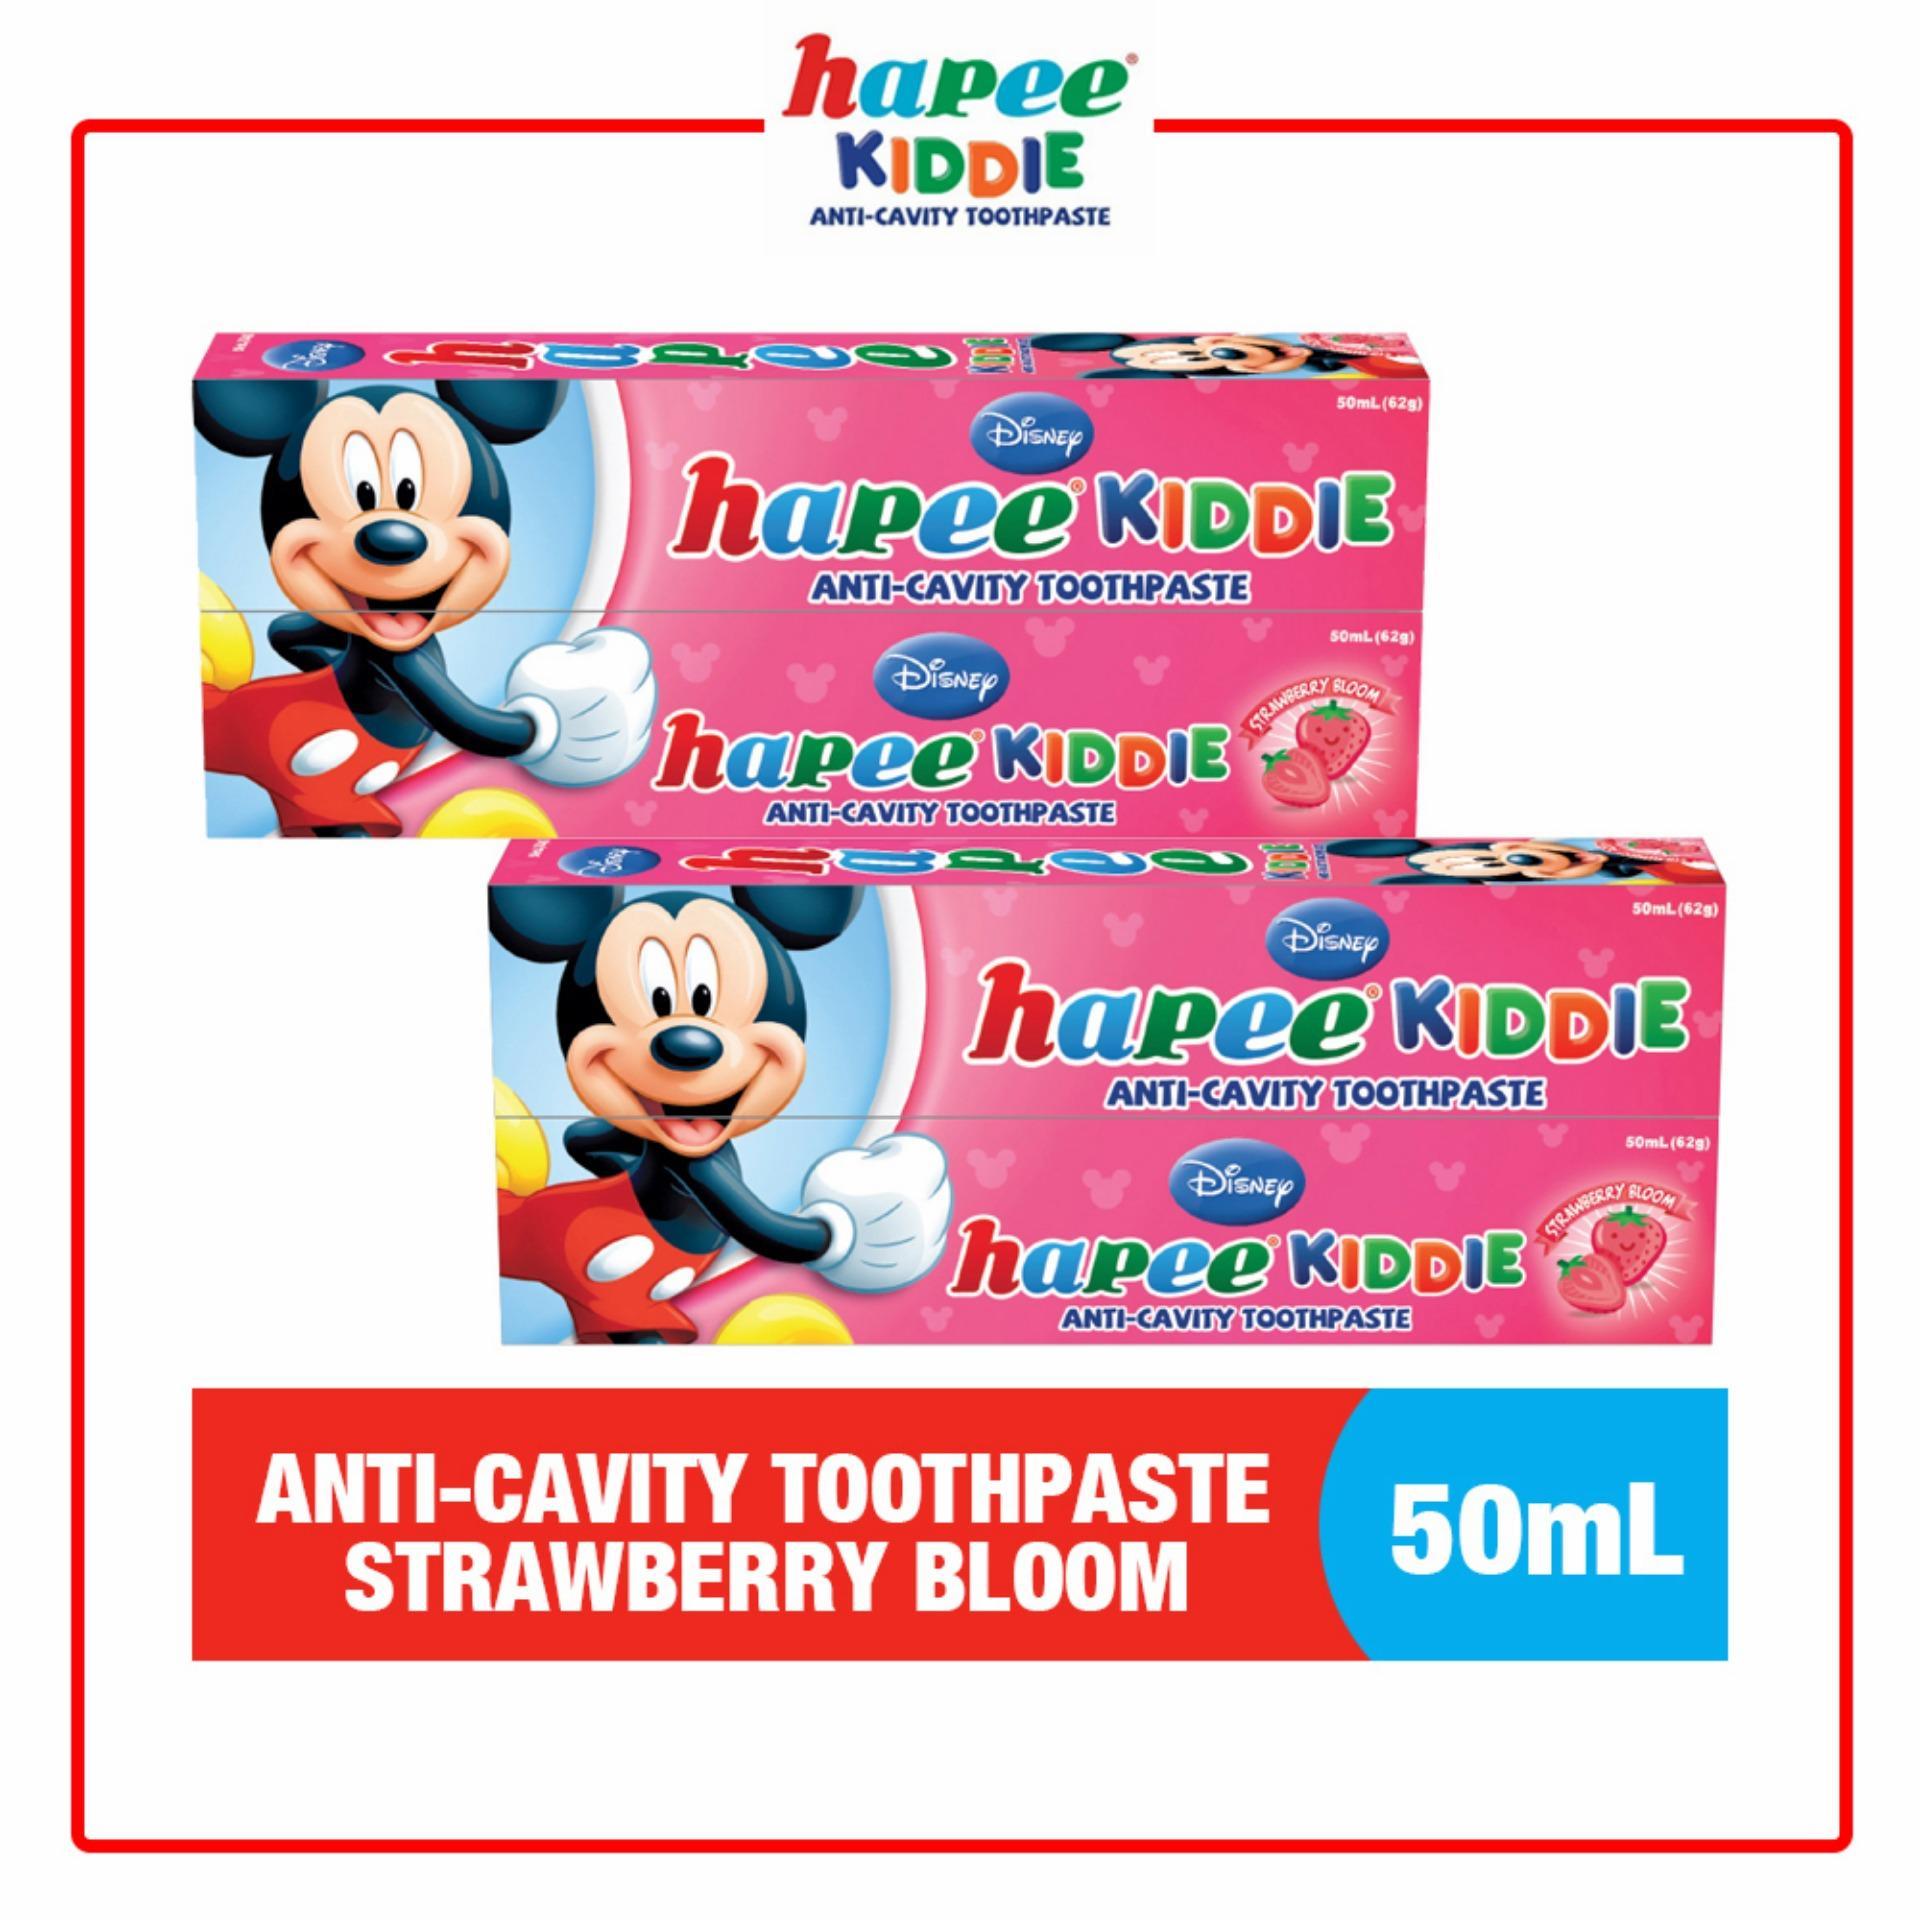 Philippines Hapee Kiddie Anti Cavity Toothpaste Strawberry Bloom Close Up Mentol Fresh 160gram Flavor 50mlset Of 4